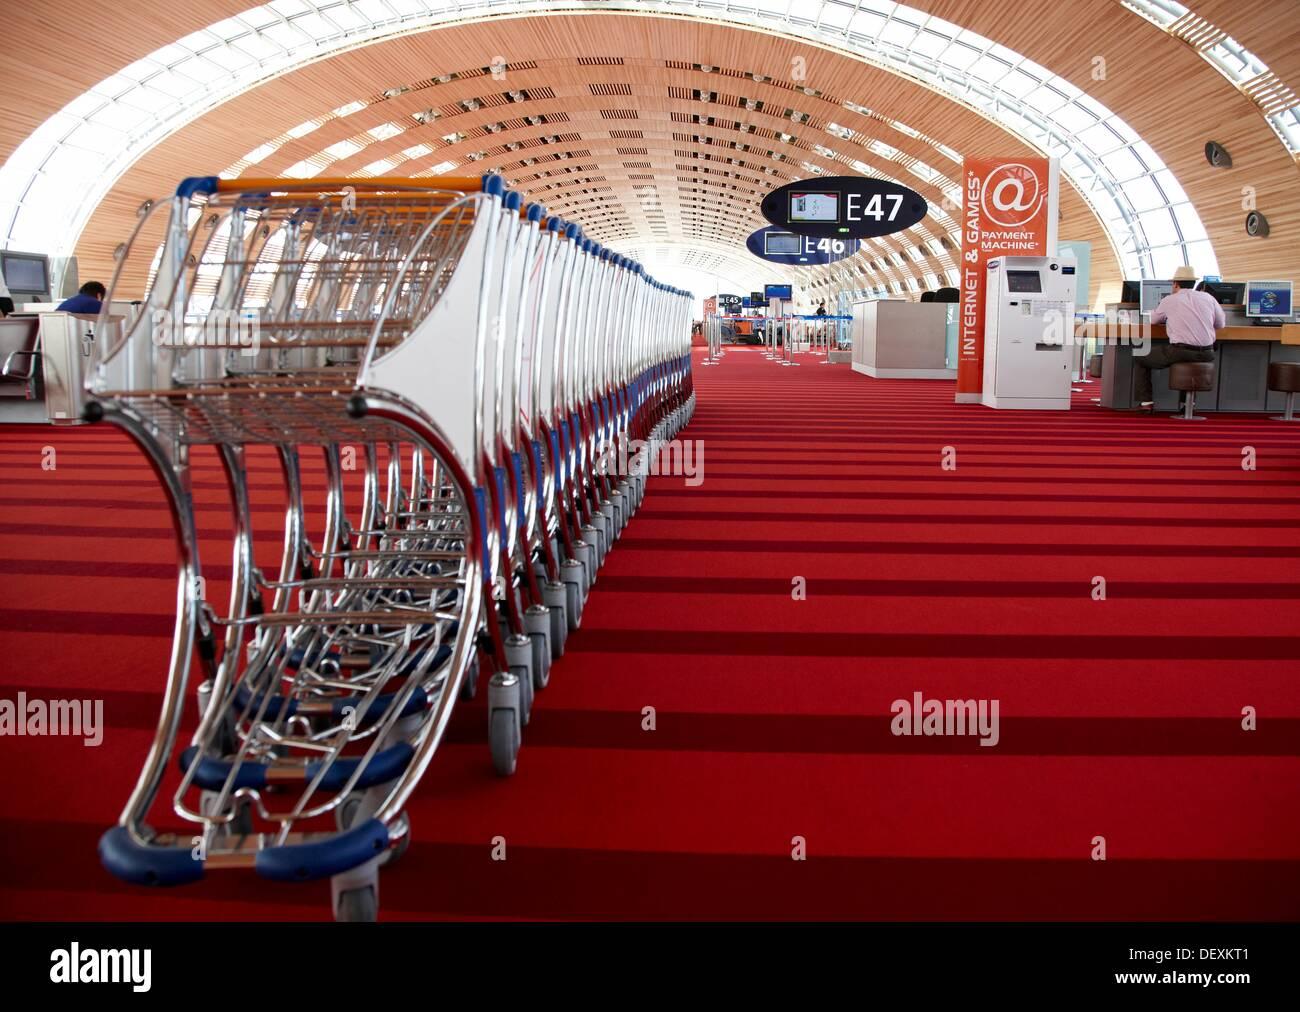 Luggage carts, Charles de Gaulle International Airport, Paris, France. - Stock Image